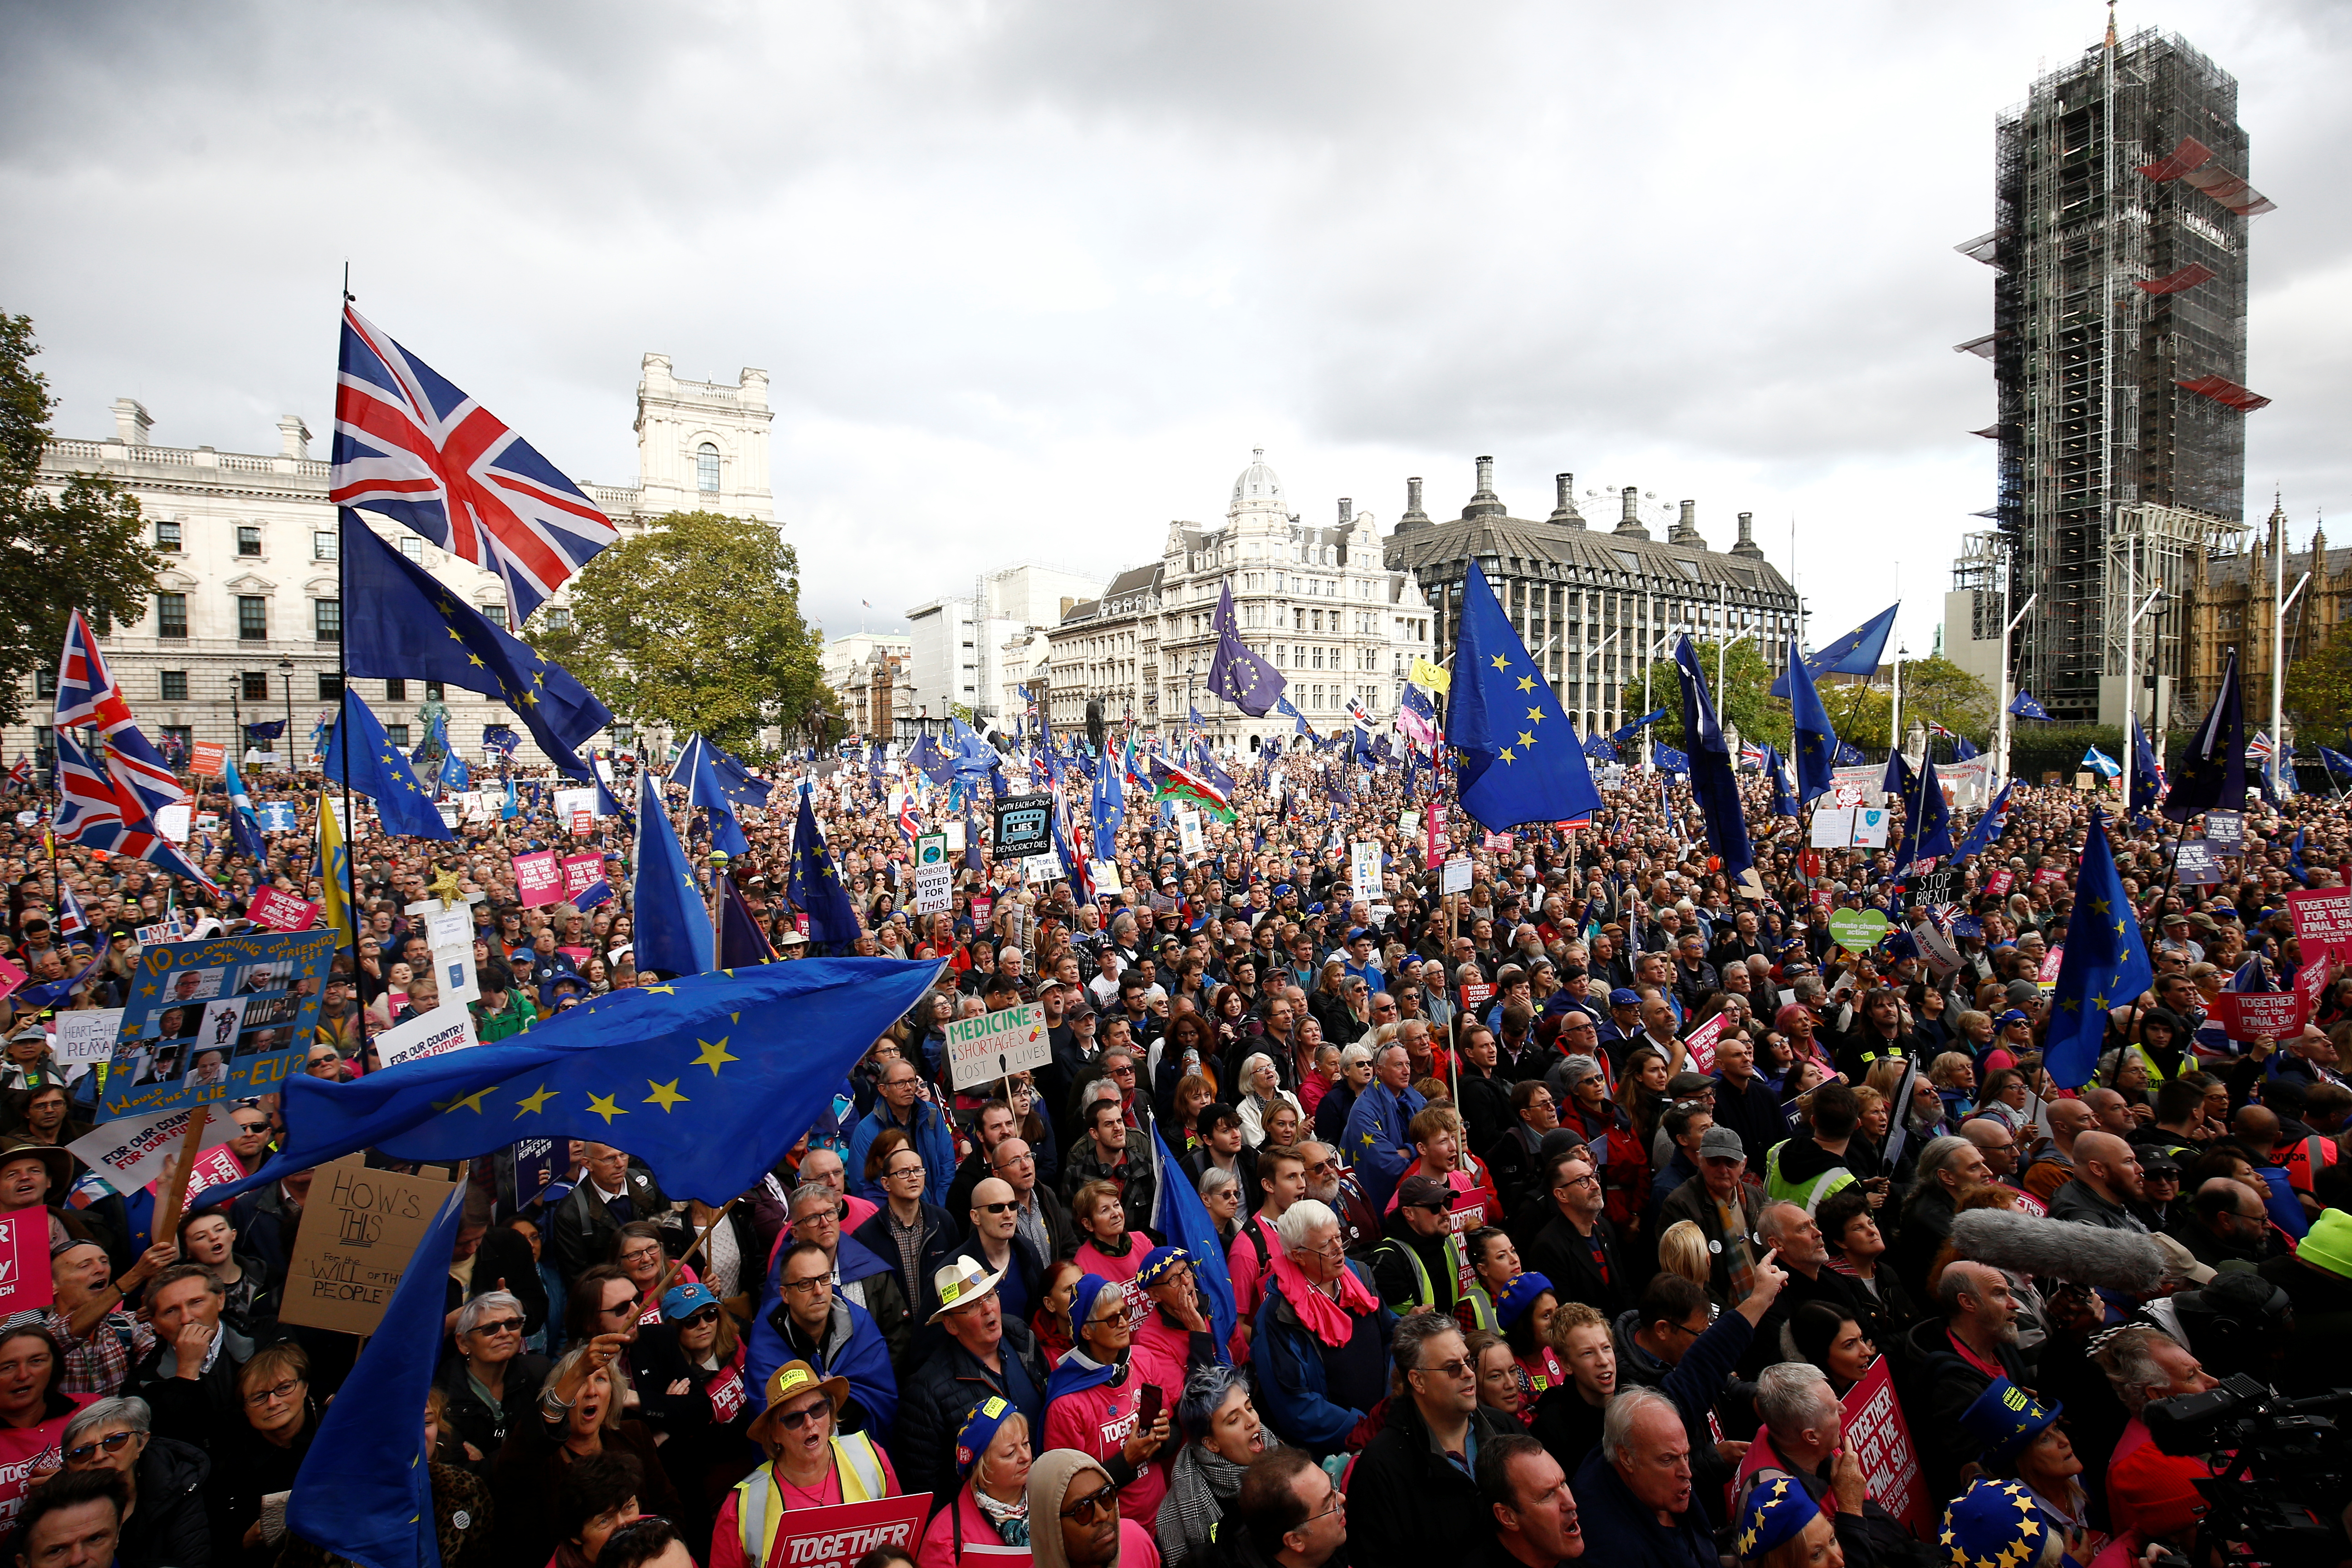 Brexit: Δεν συμφώνησαν στο χρονοδιάγραμμα Τζόνσον – Κόρμπιν! Στο προσκήνιο και πάλι οι πρόωρες εκλογές